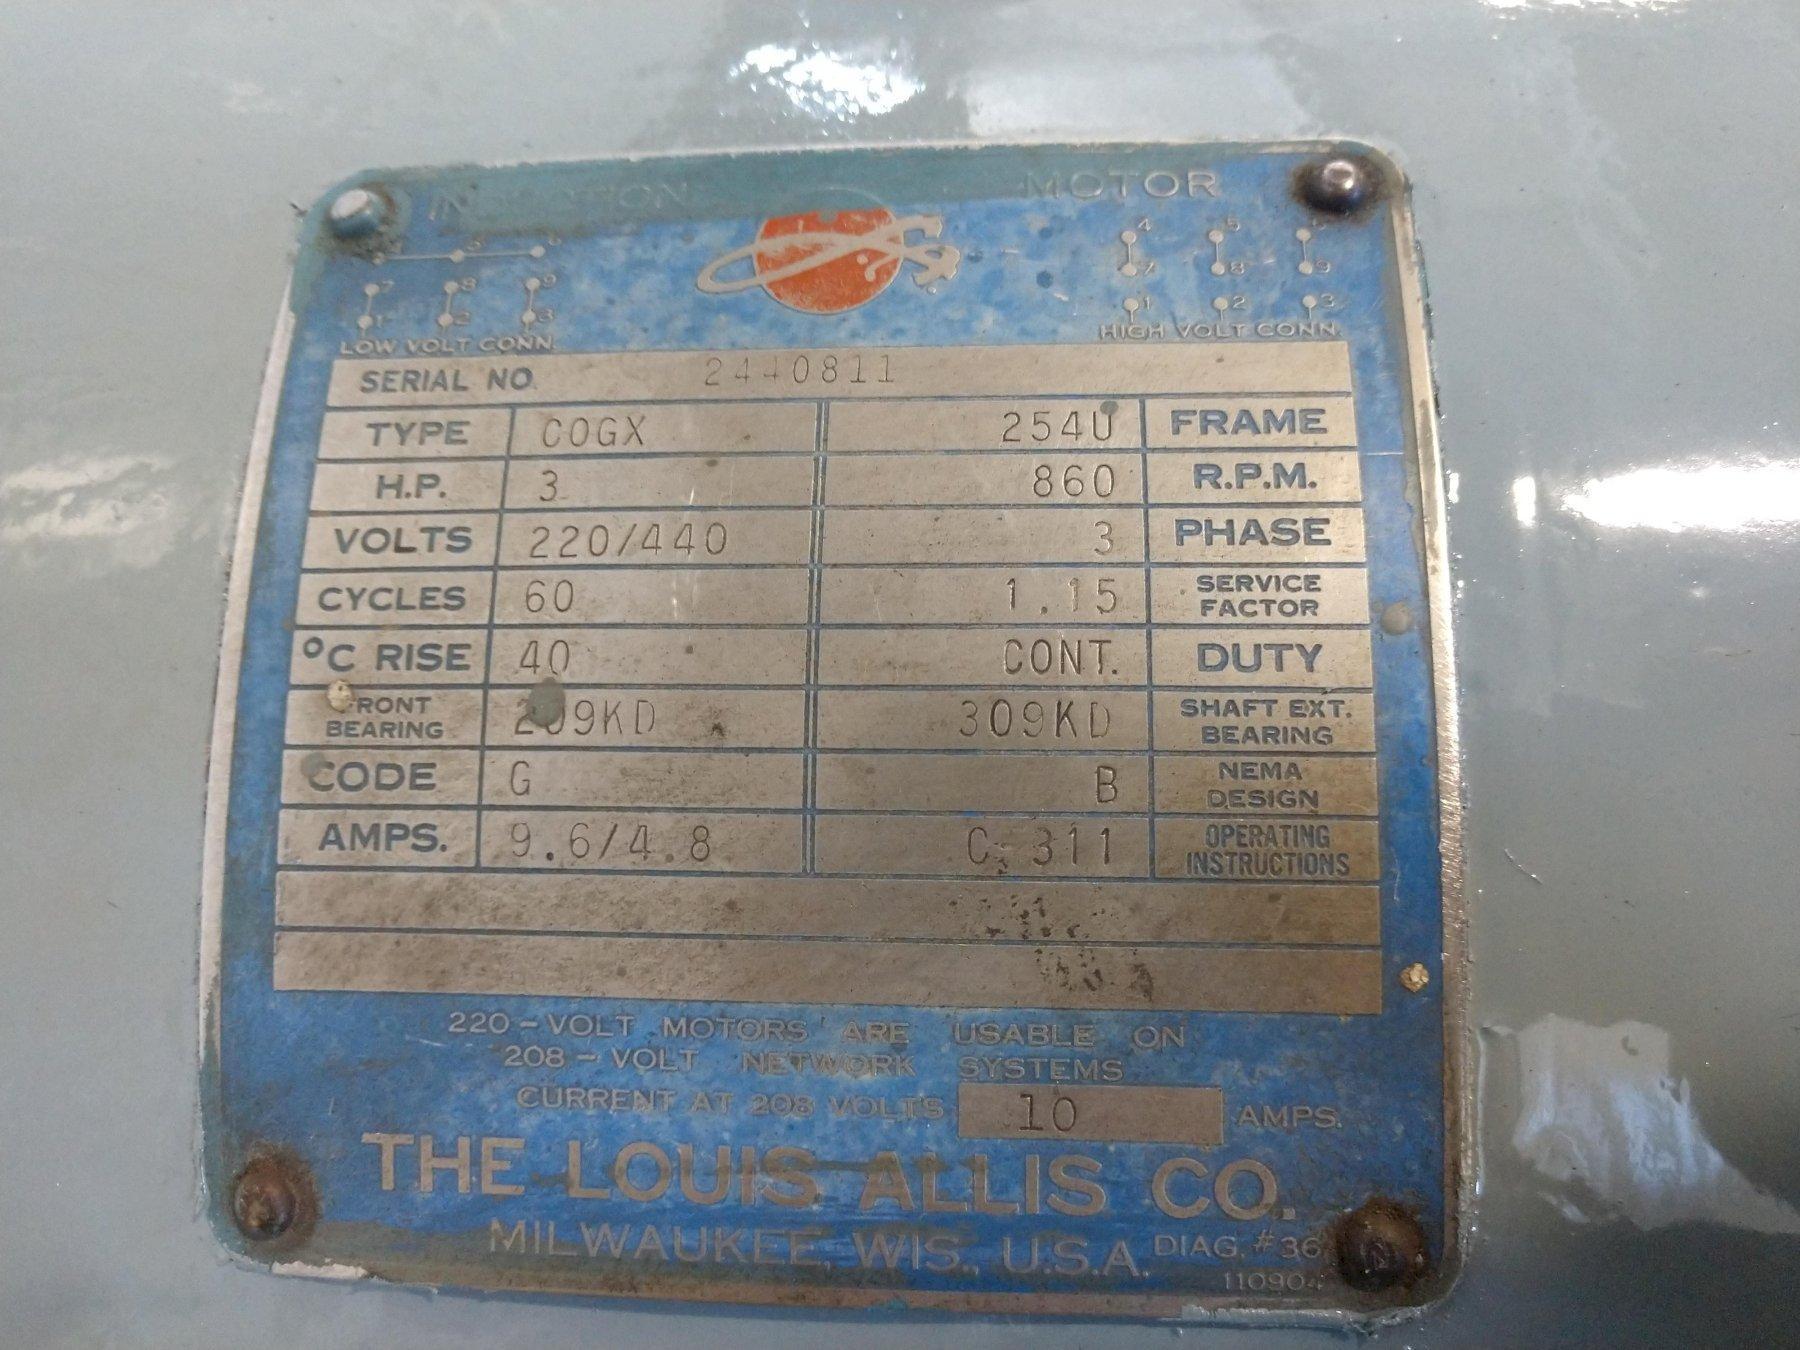 "25"" CLEERMAN MODEL #25C POWER FEED SINGLE SPINDLE BOX COLUMN DRILL: STOCK #13169"